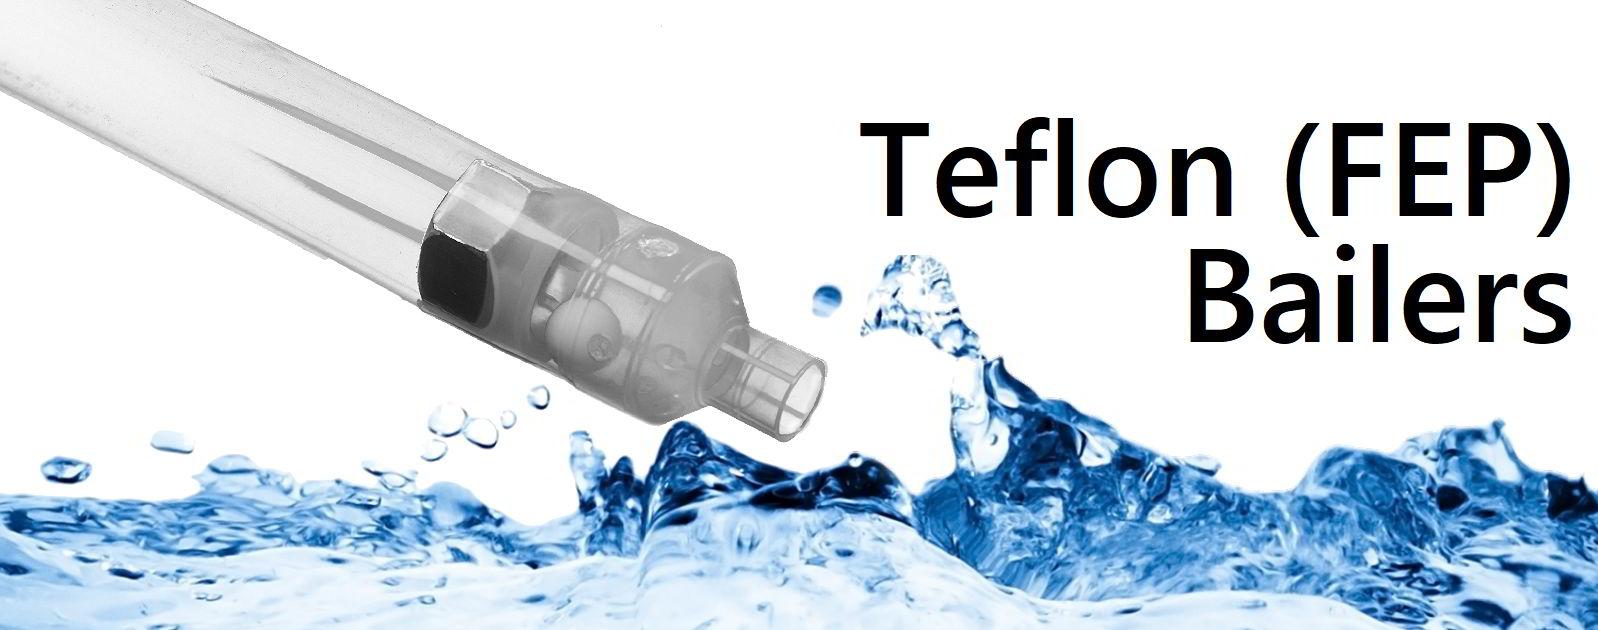 Teflon®/FEP Bailers